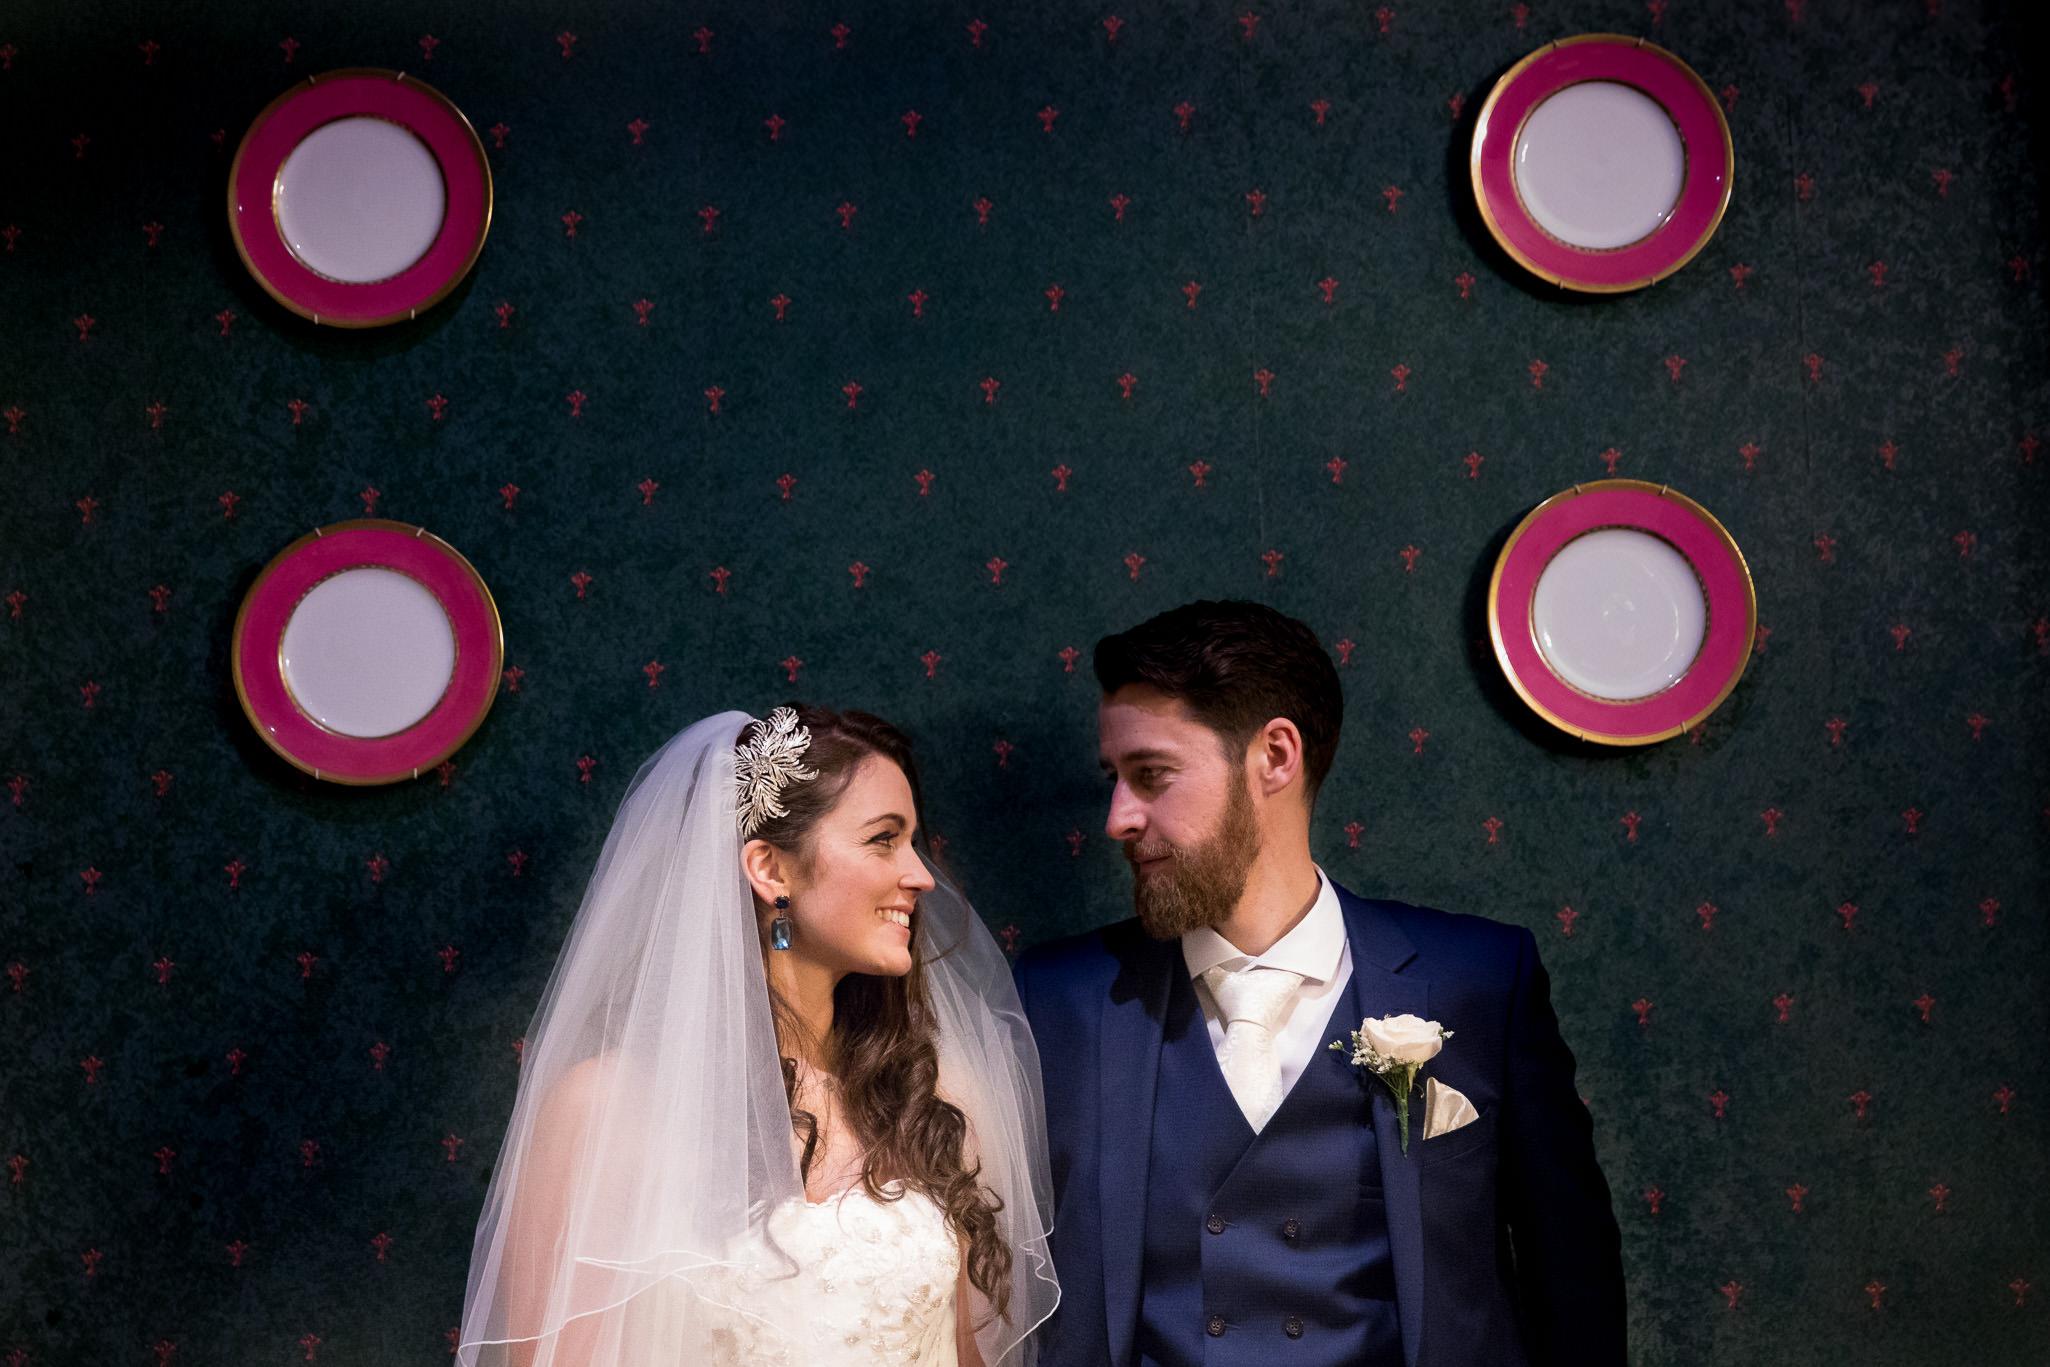 clairebyrnephotography-wedding-night-sparklers-new-years-eve-denyce-leonard-19.jpg